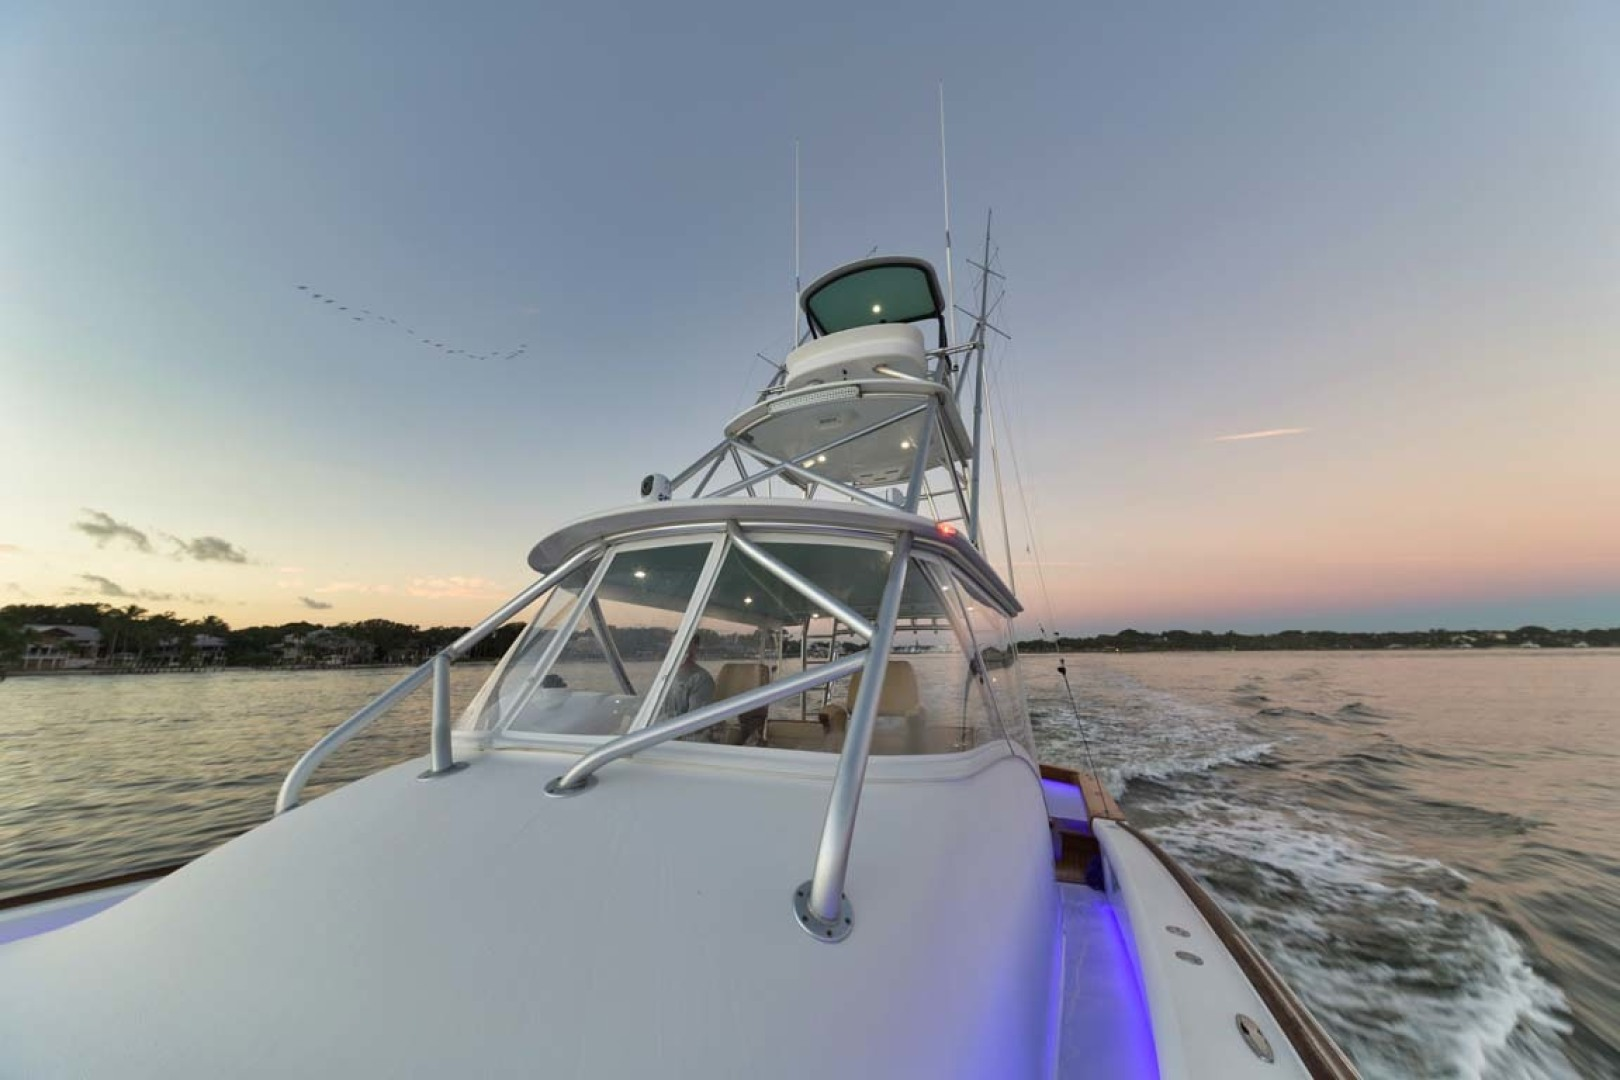 Winter Custom Yachts-46 Walkaround 2019-Family Circus Stuart-Florida-United States-Port Side Deck with Lighting-1563733 | Thumbnail